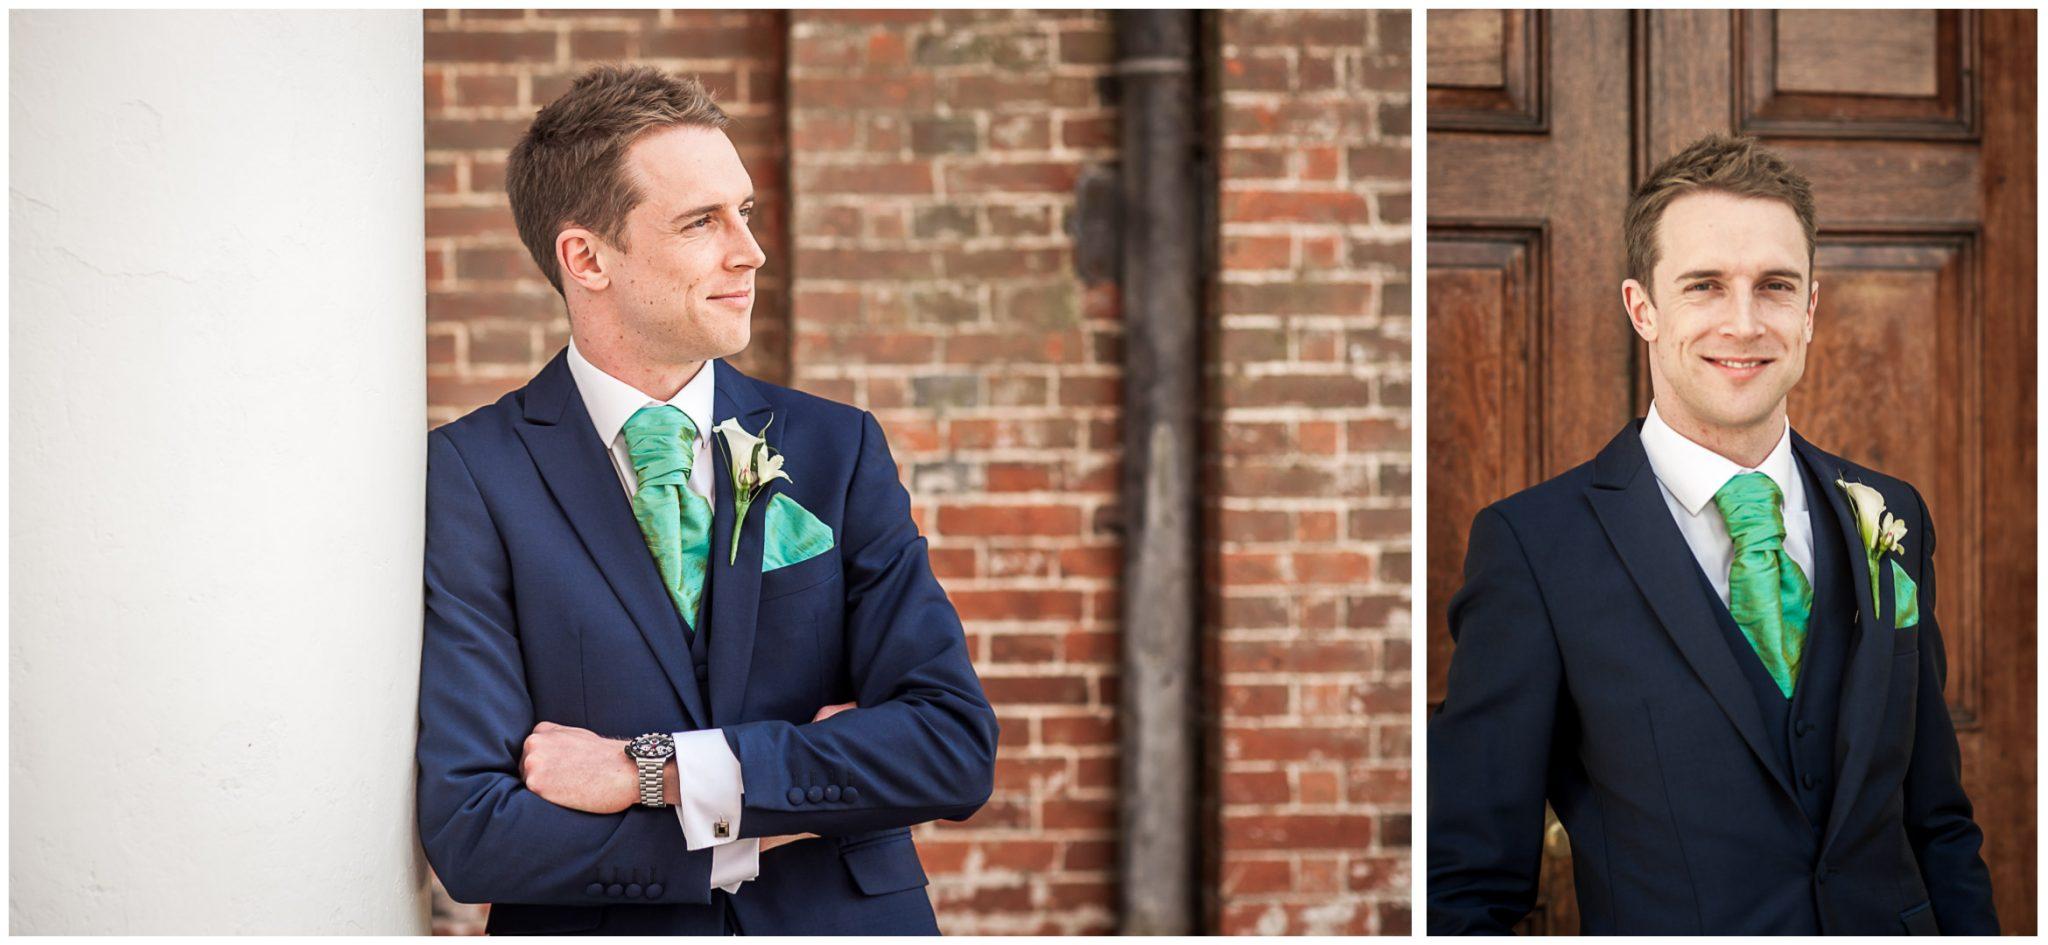 Avington Park wedding photography groom colourportraits